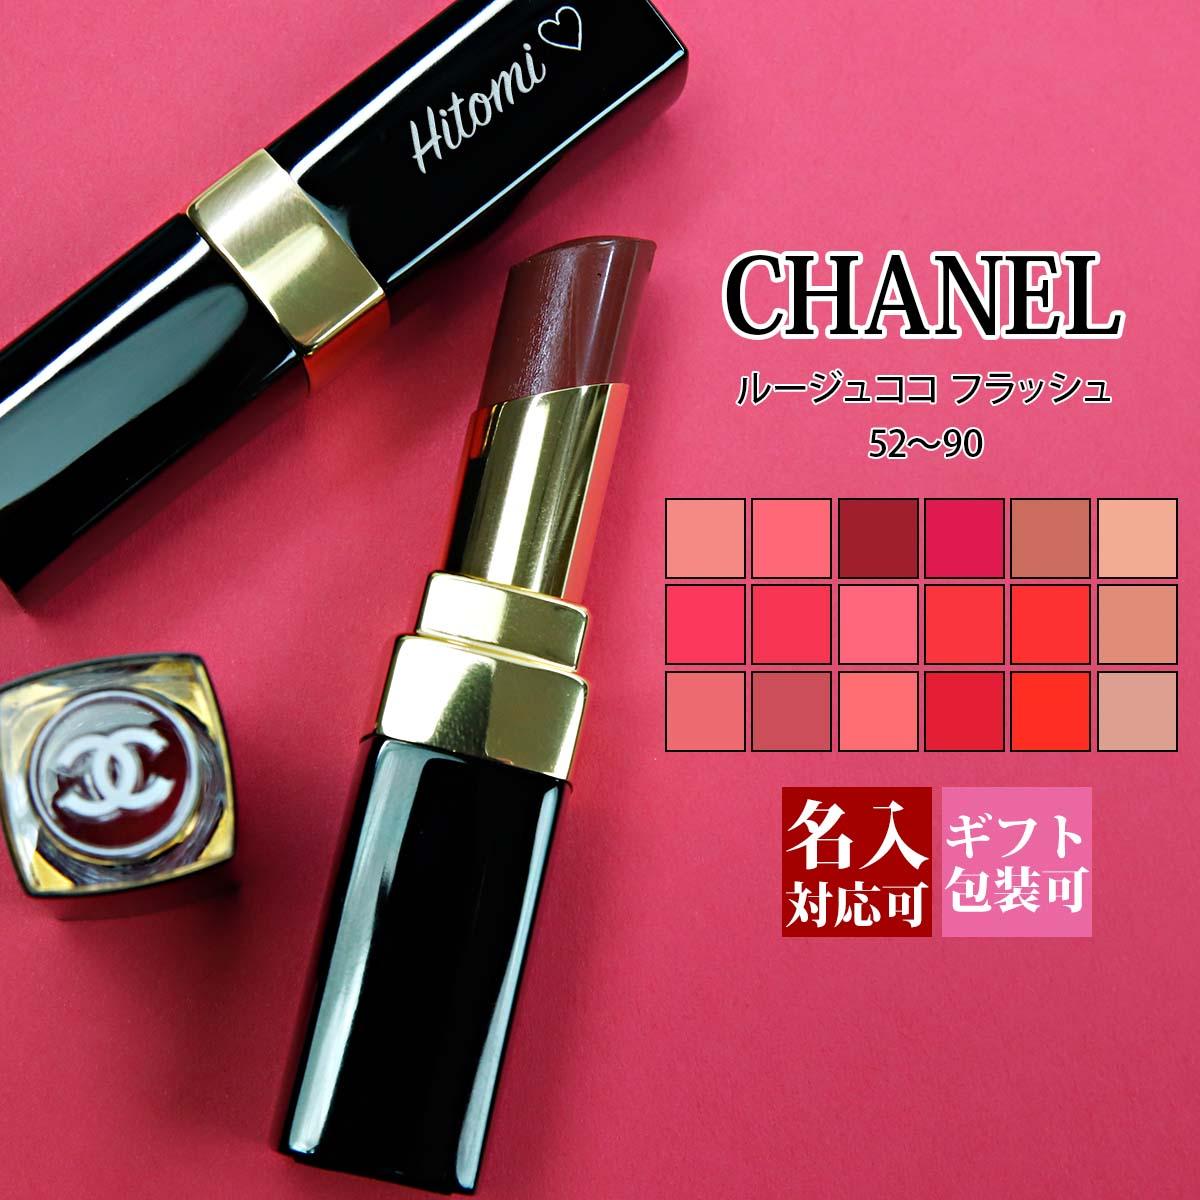 CHANEL lipstick CHANEL 2021